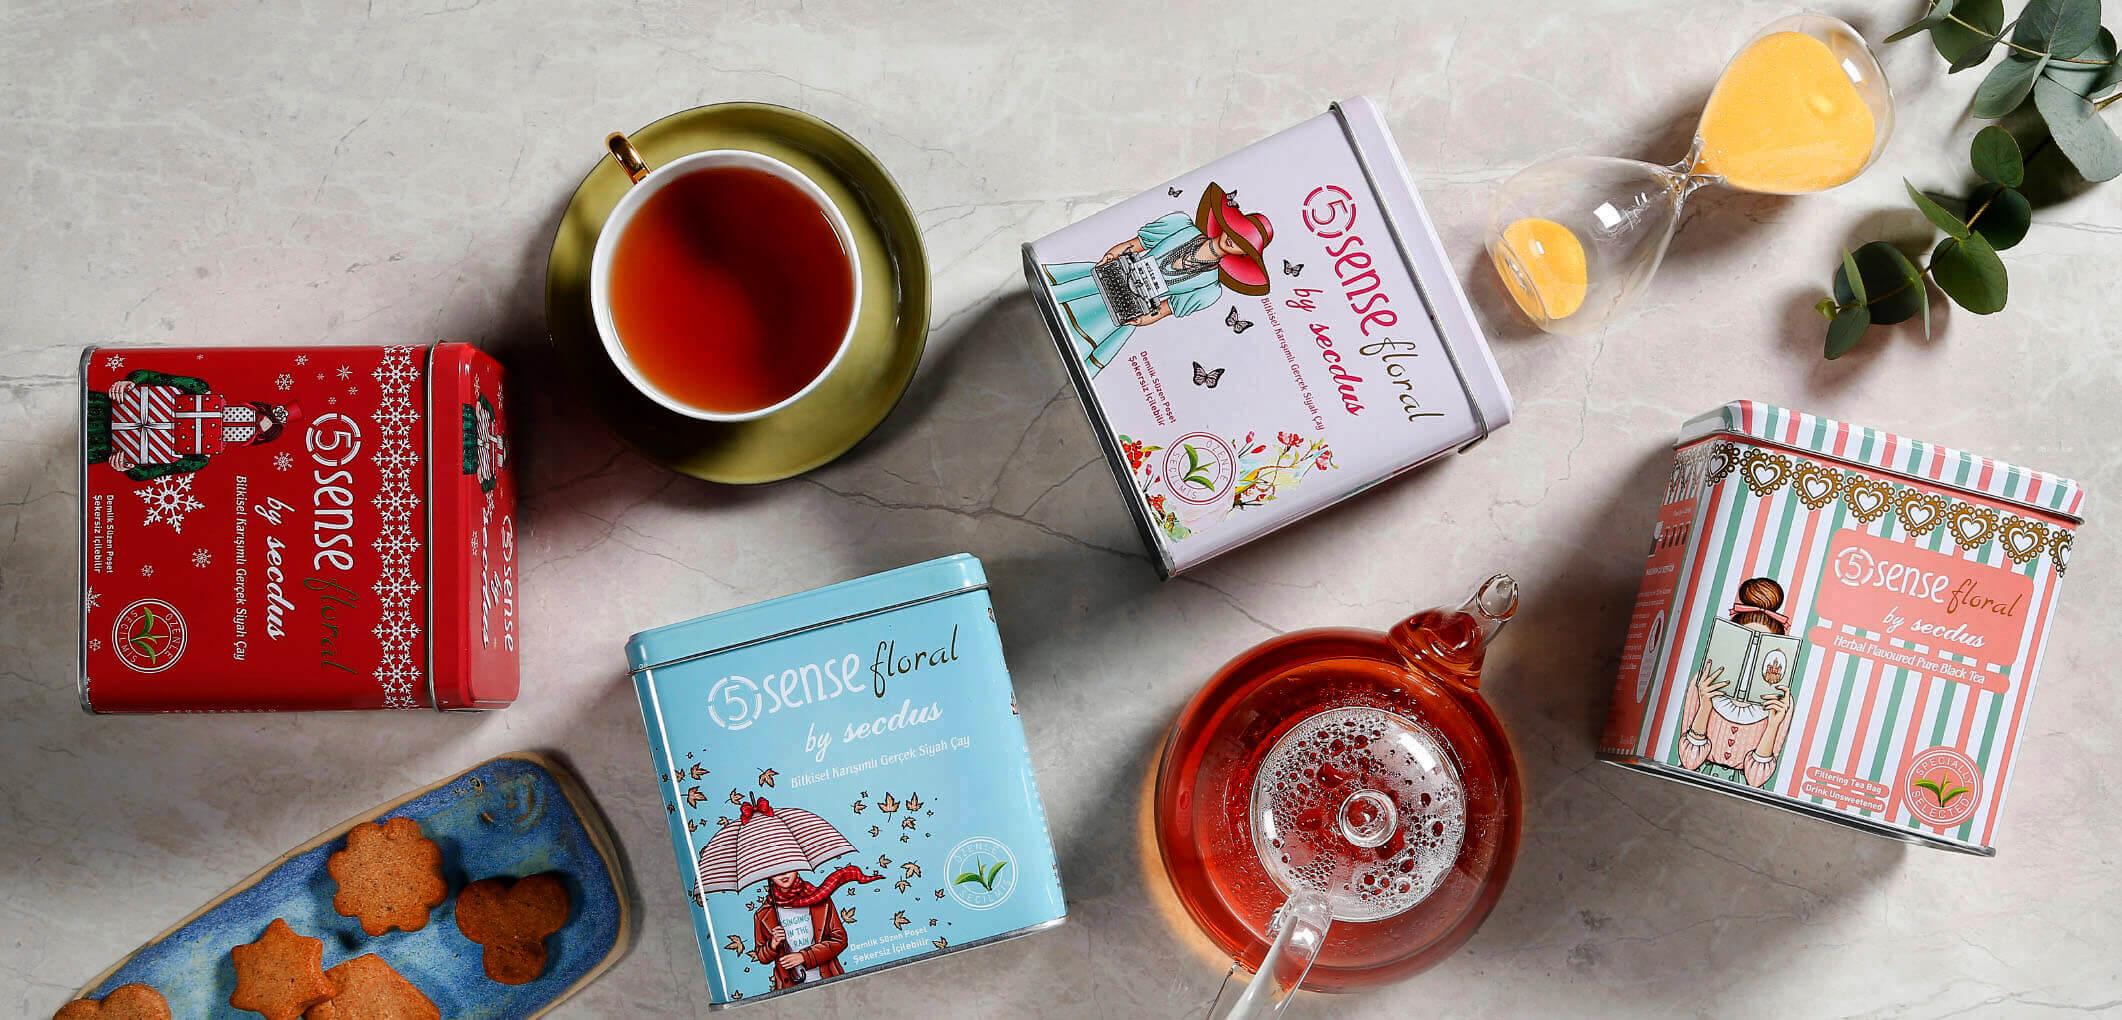 5 Sense Tea